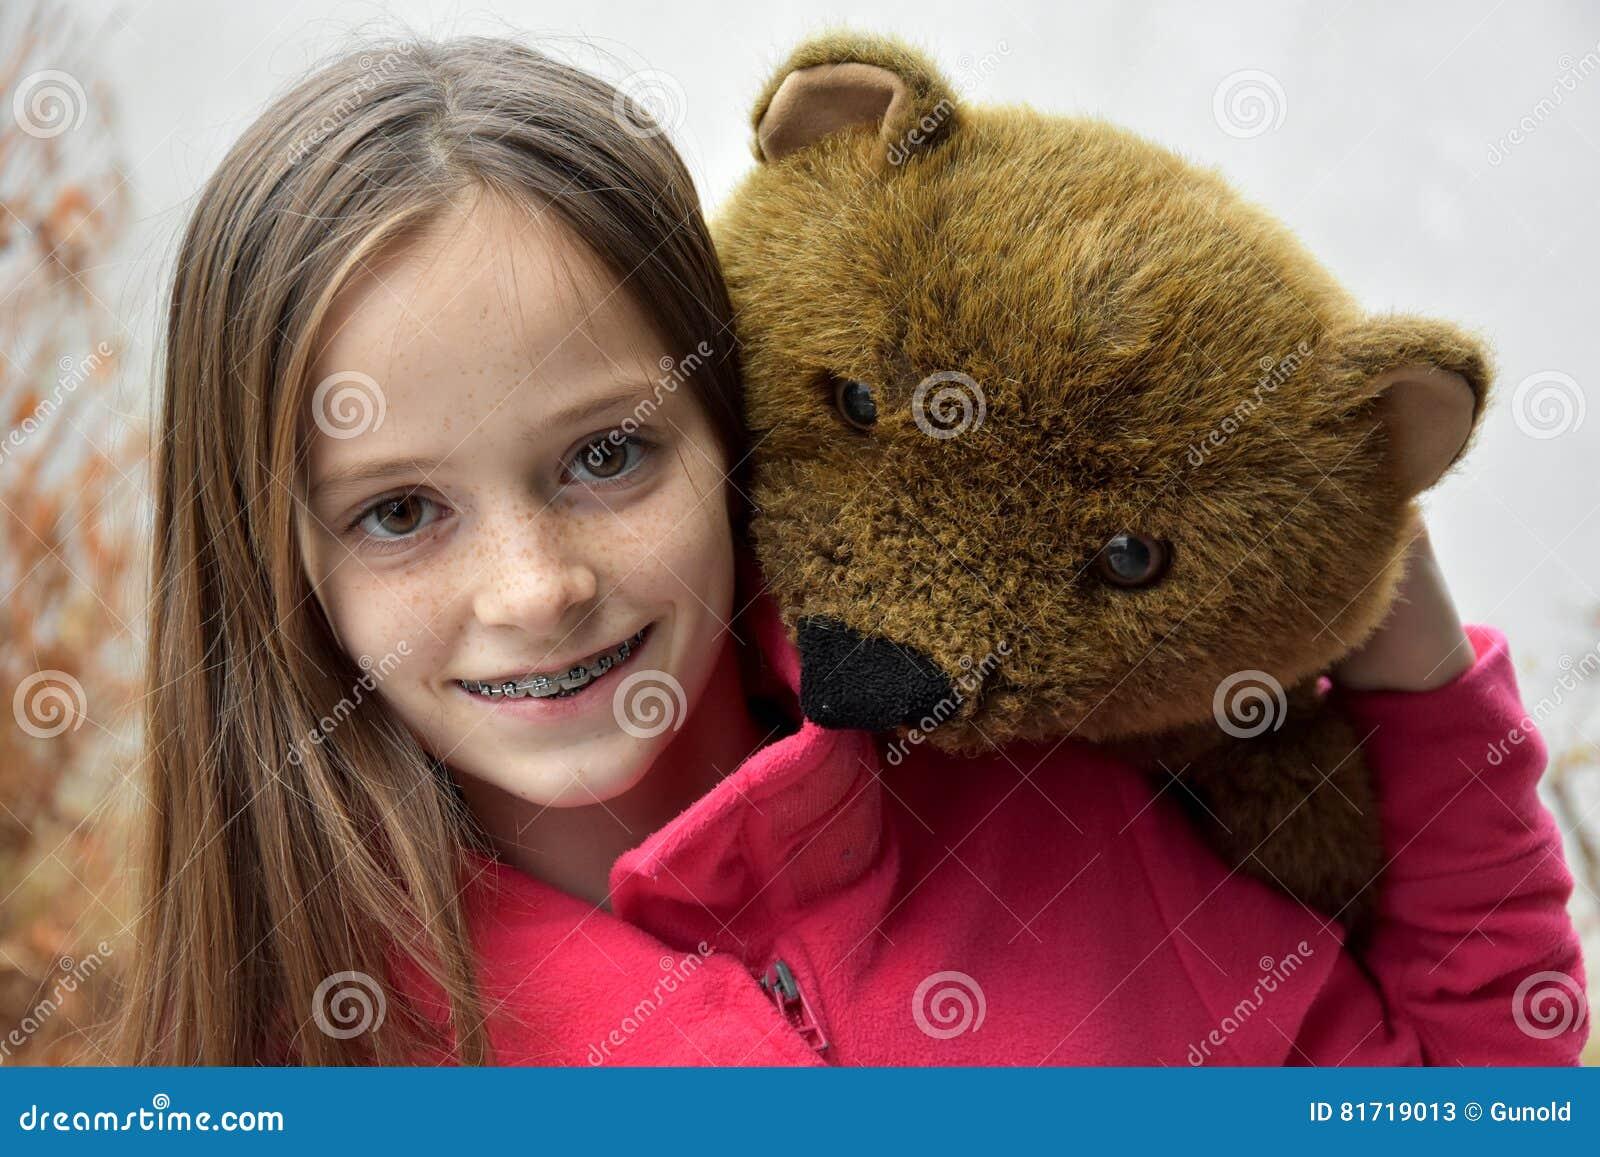 bear teenage